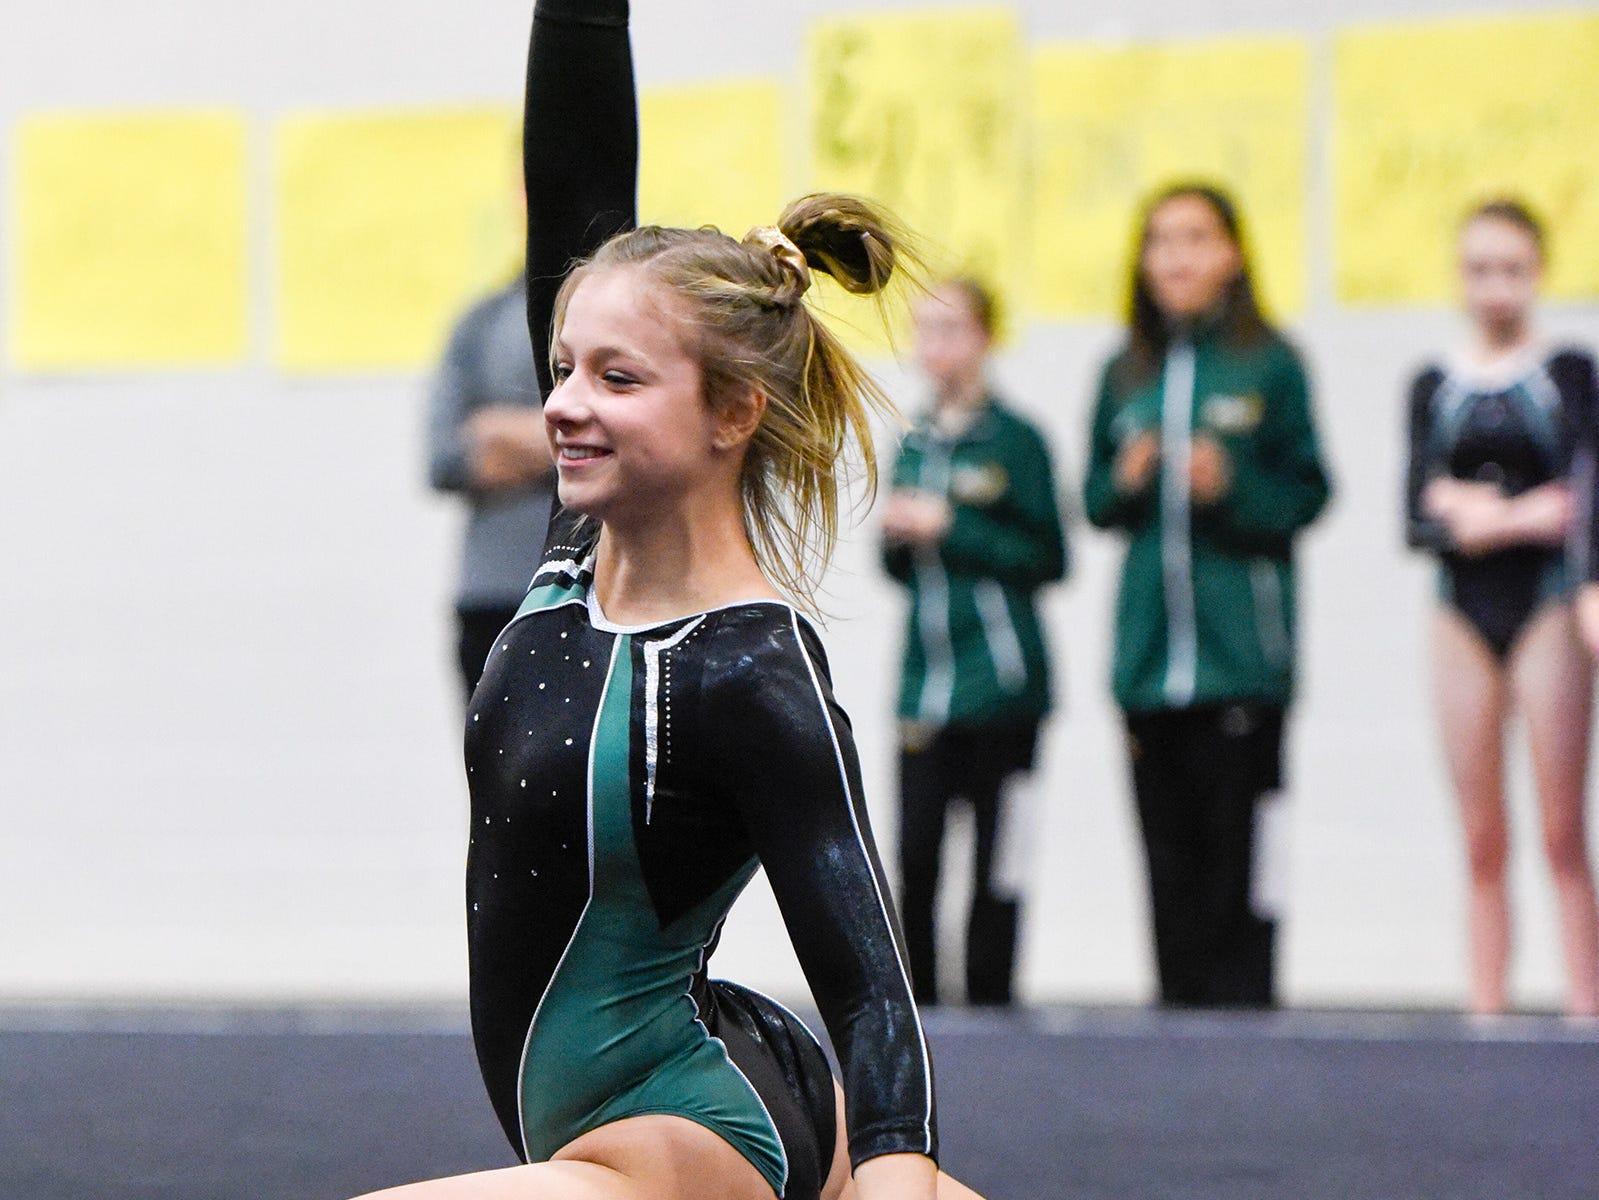 Sauk Rapids' Elie Weinert does her floor routine Thursday, Jan. 3, at the Sauk Rapids-Rice High School.